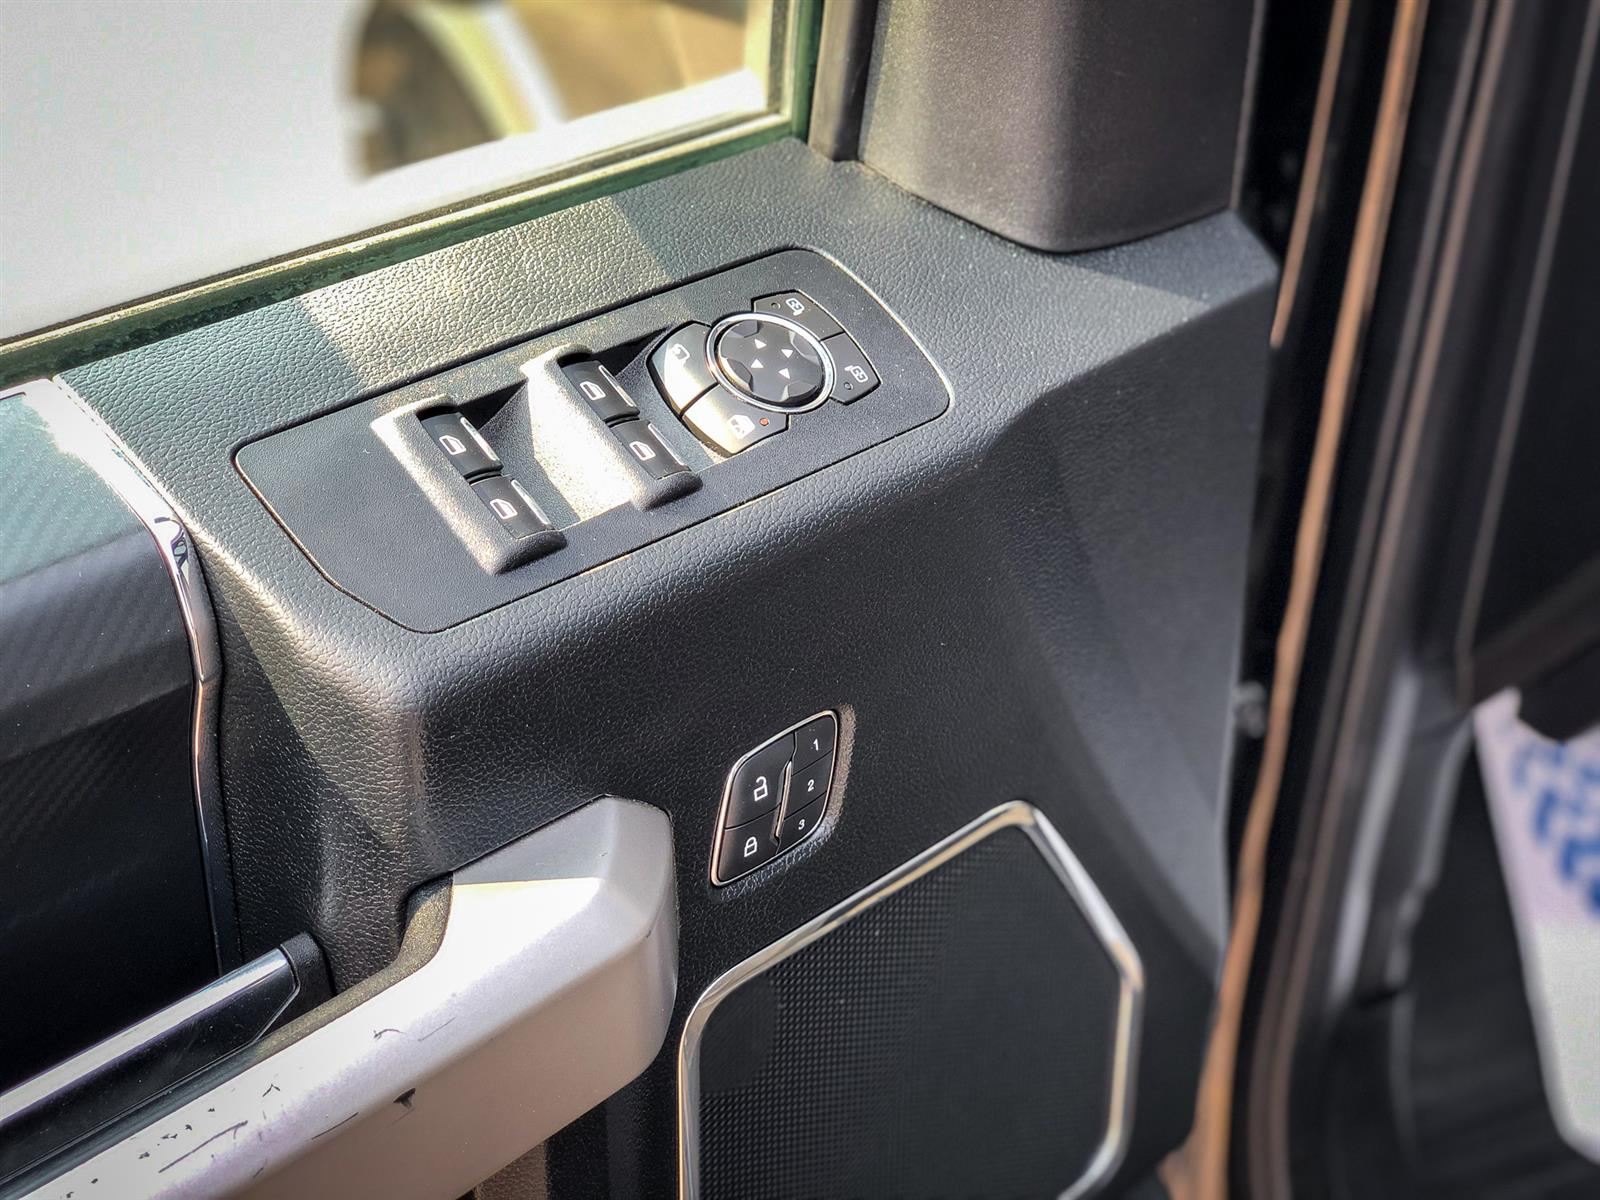 2019 Ford F-150 LARIAT | 3.5L V6 ECOBOOST | 4X4 | HEATED STEERING | NAVIGATION